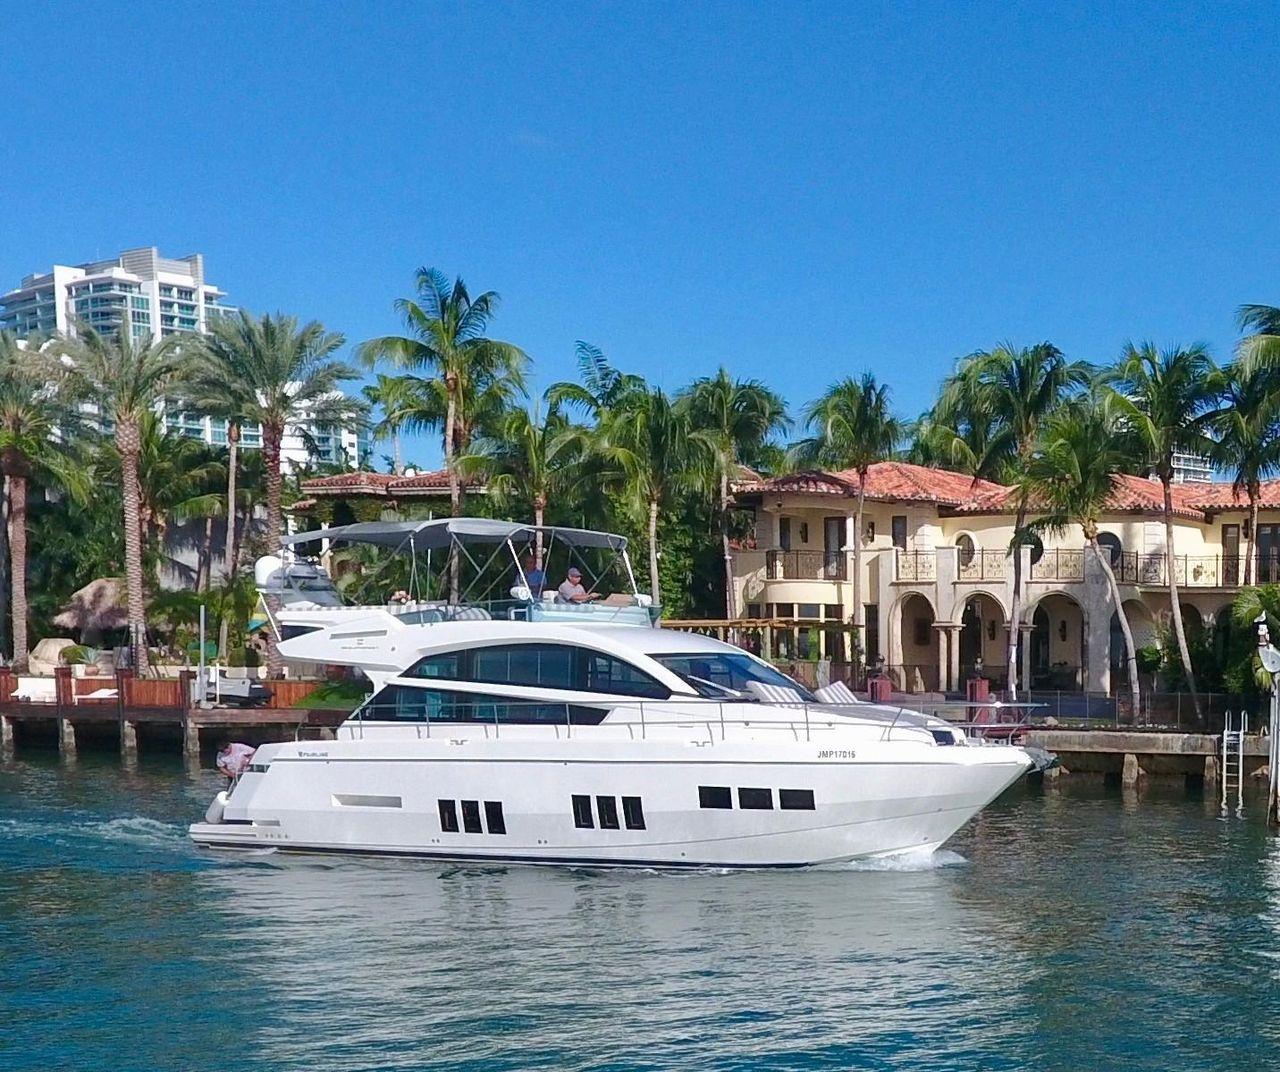 53539de7353a7 2012 Used Fairline Squadron 50 Motor Yacht For Sale -  599